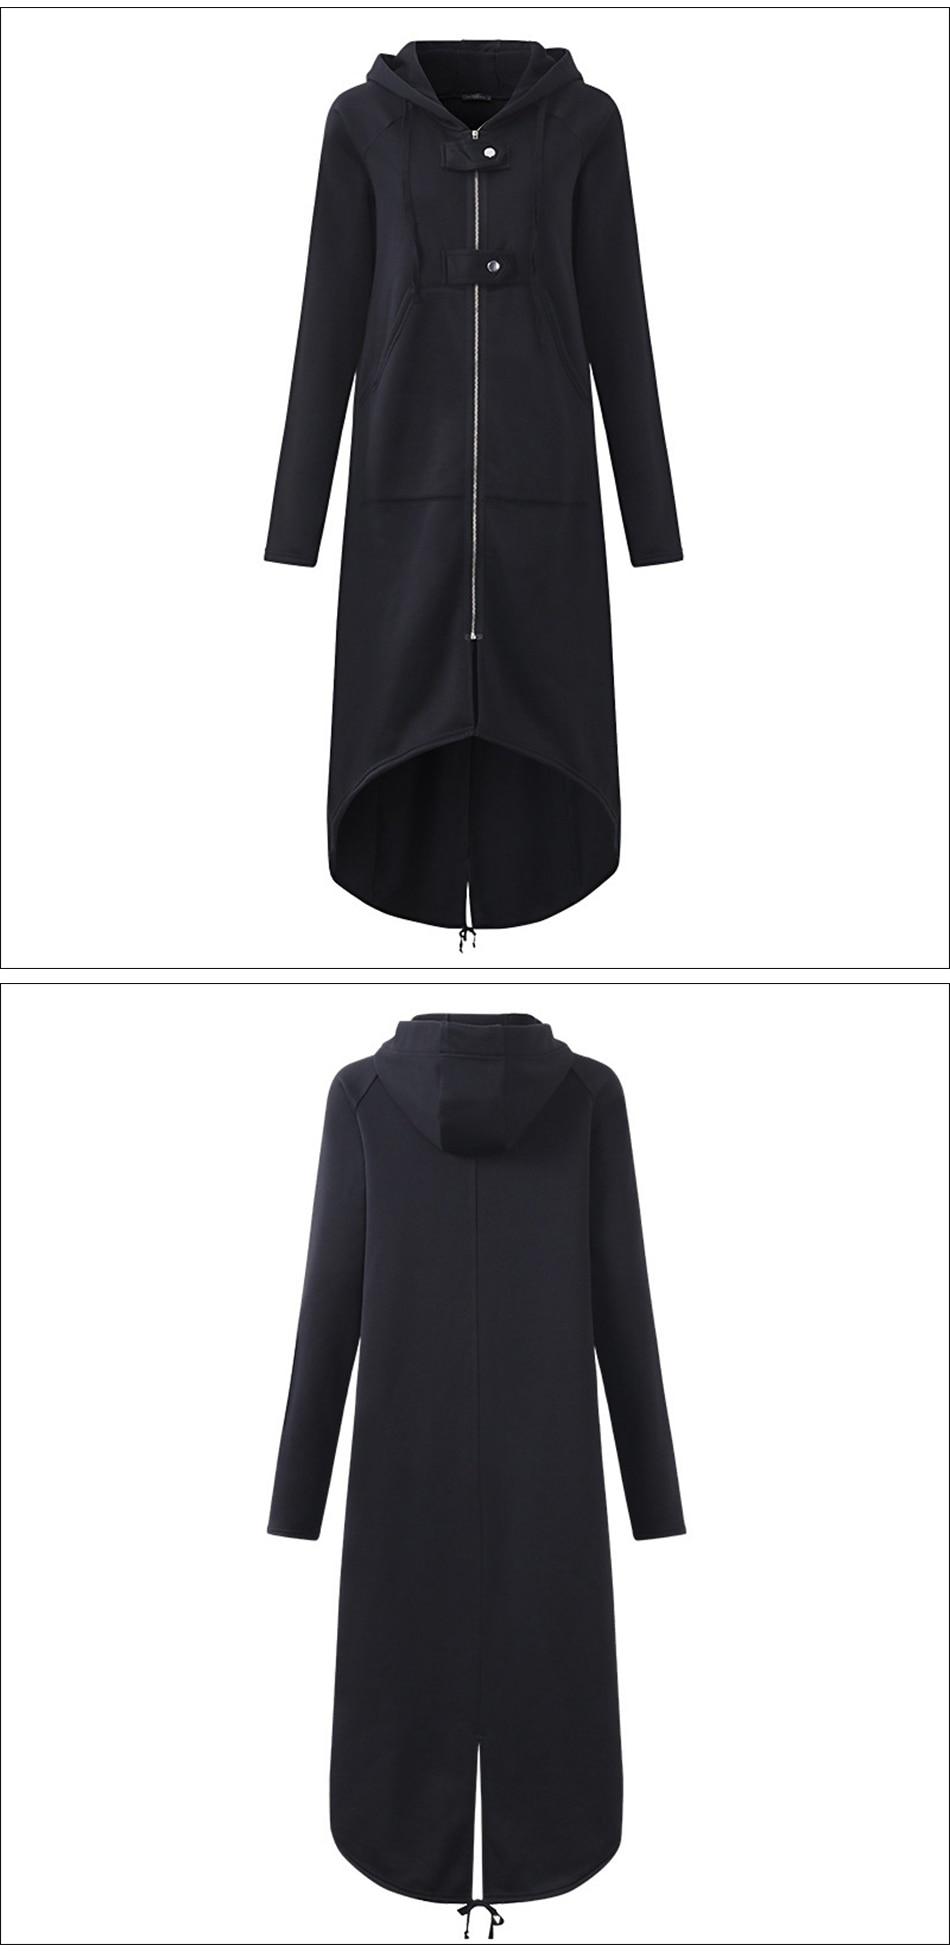 CROPKOP Fashion Long Sleeve Hooded Trench Coat 18 Autumn Black Zipper Plus Size 5XL Velvet Long Coat Women Overcoat Clothes 3